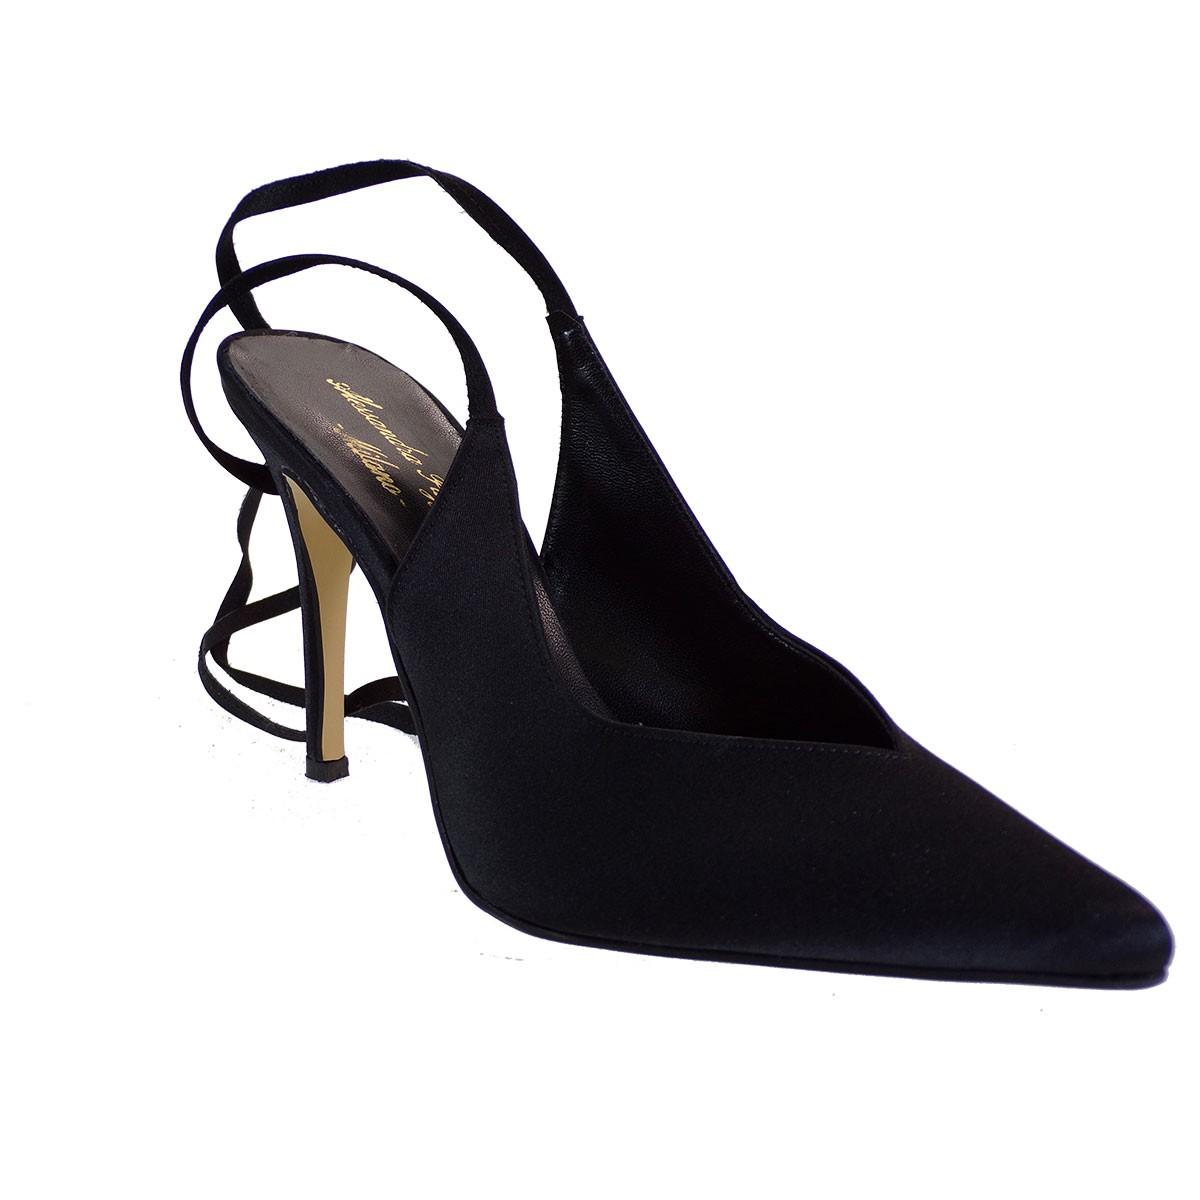 Alessandra Paggioti Γυναικεία Παπούτσια Γόβες 89685 Μαύρο Σατέν